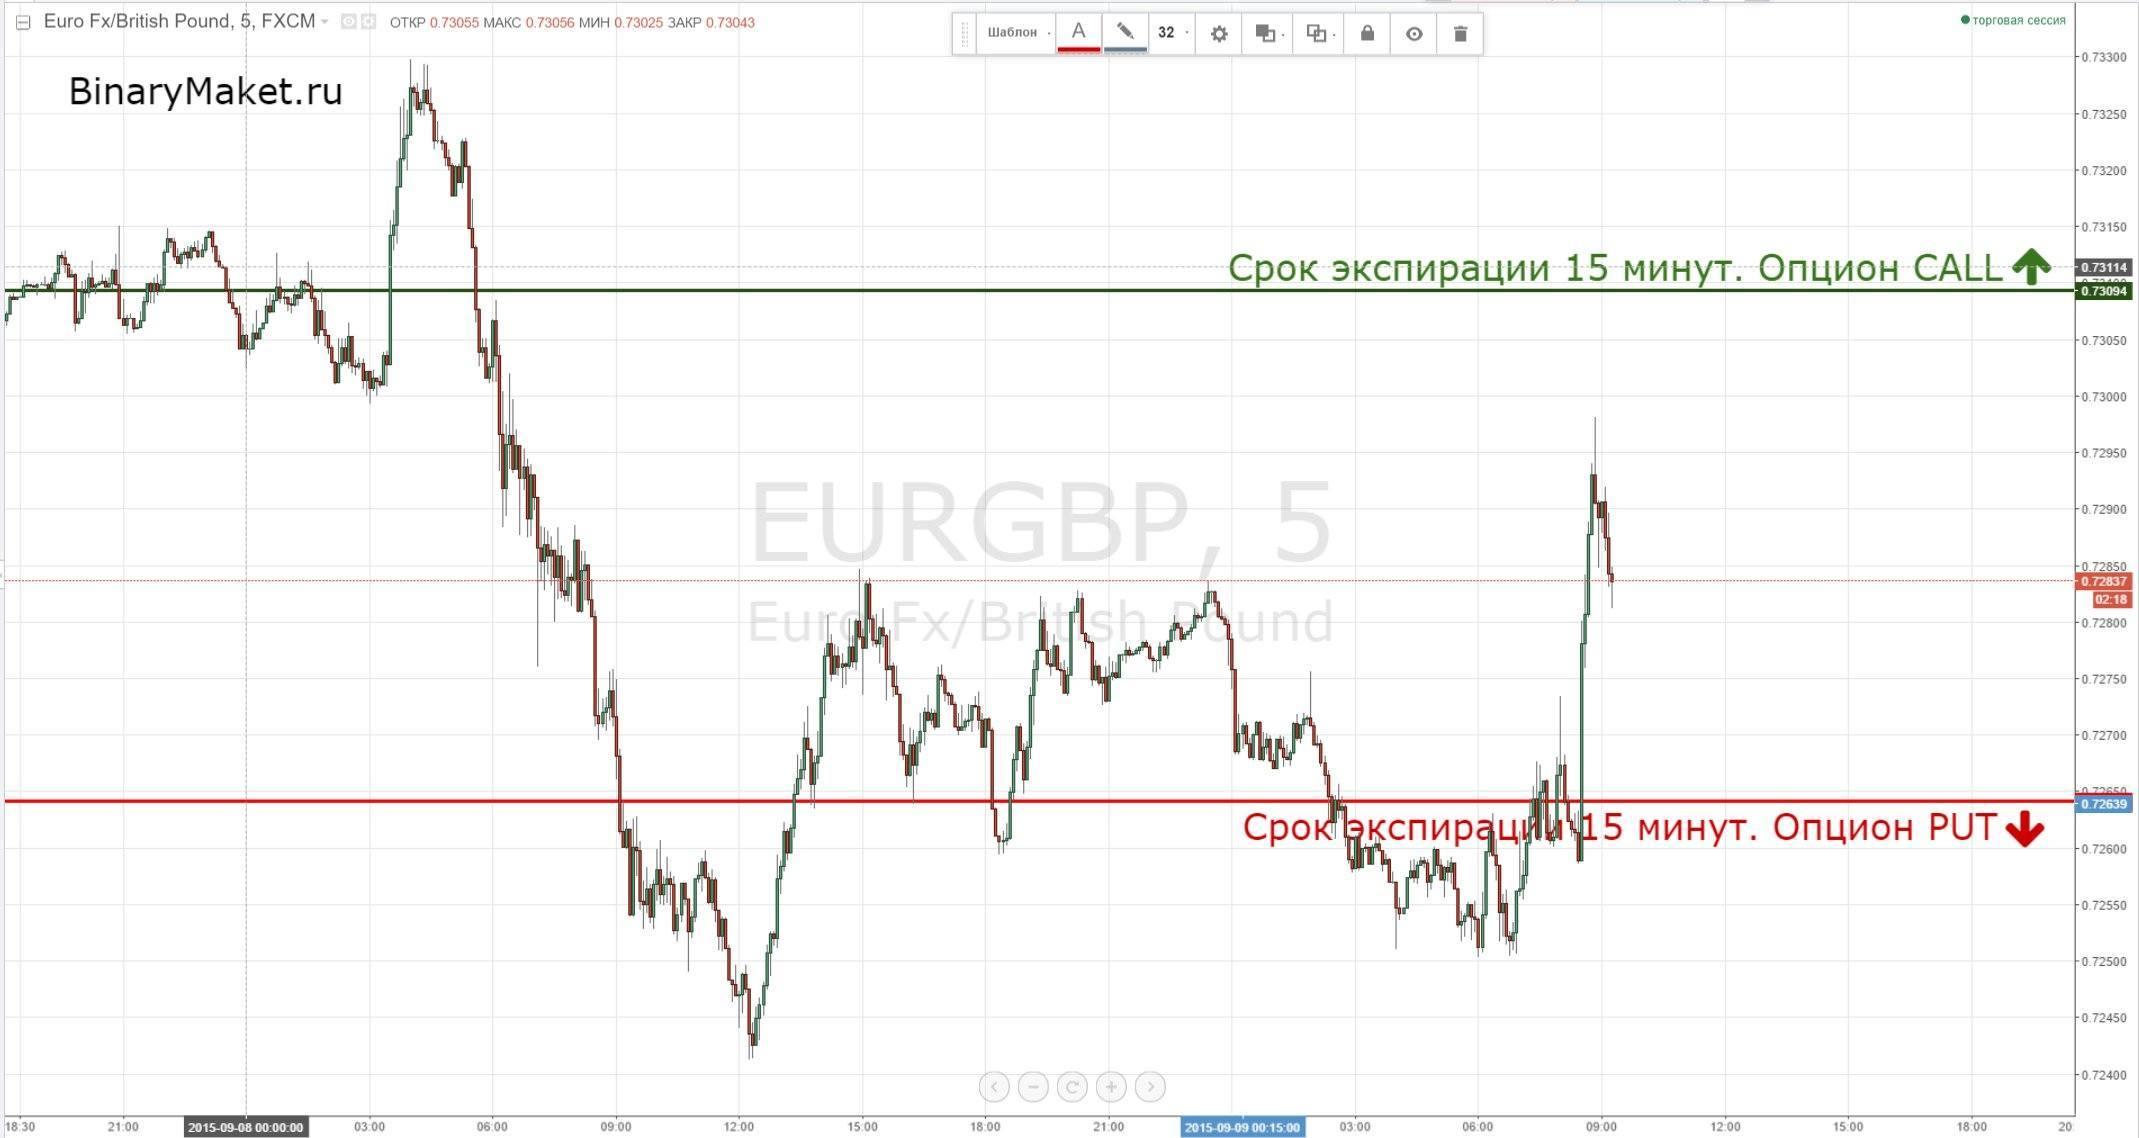 Сигналы по EURGBP на 09-09-2015